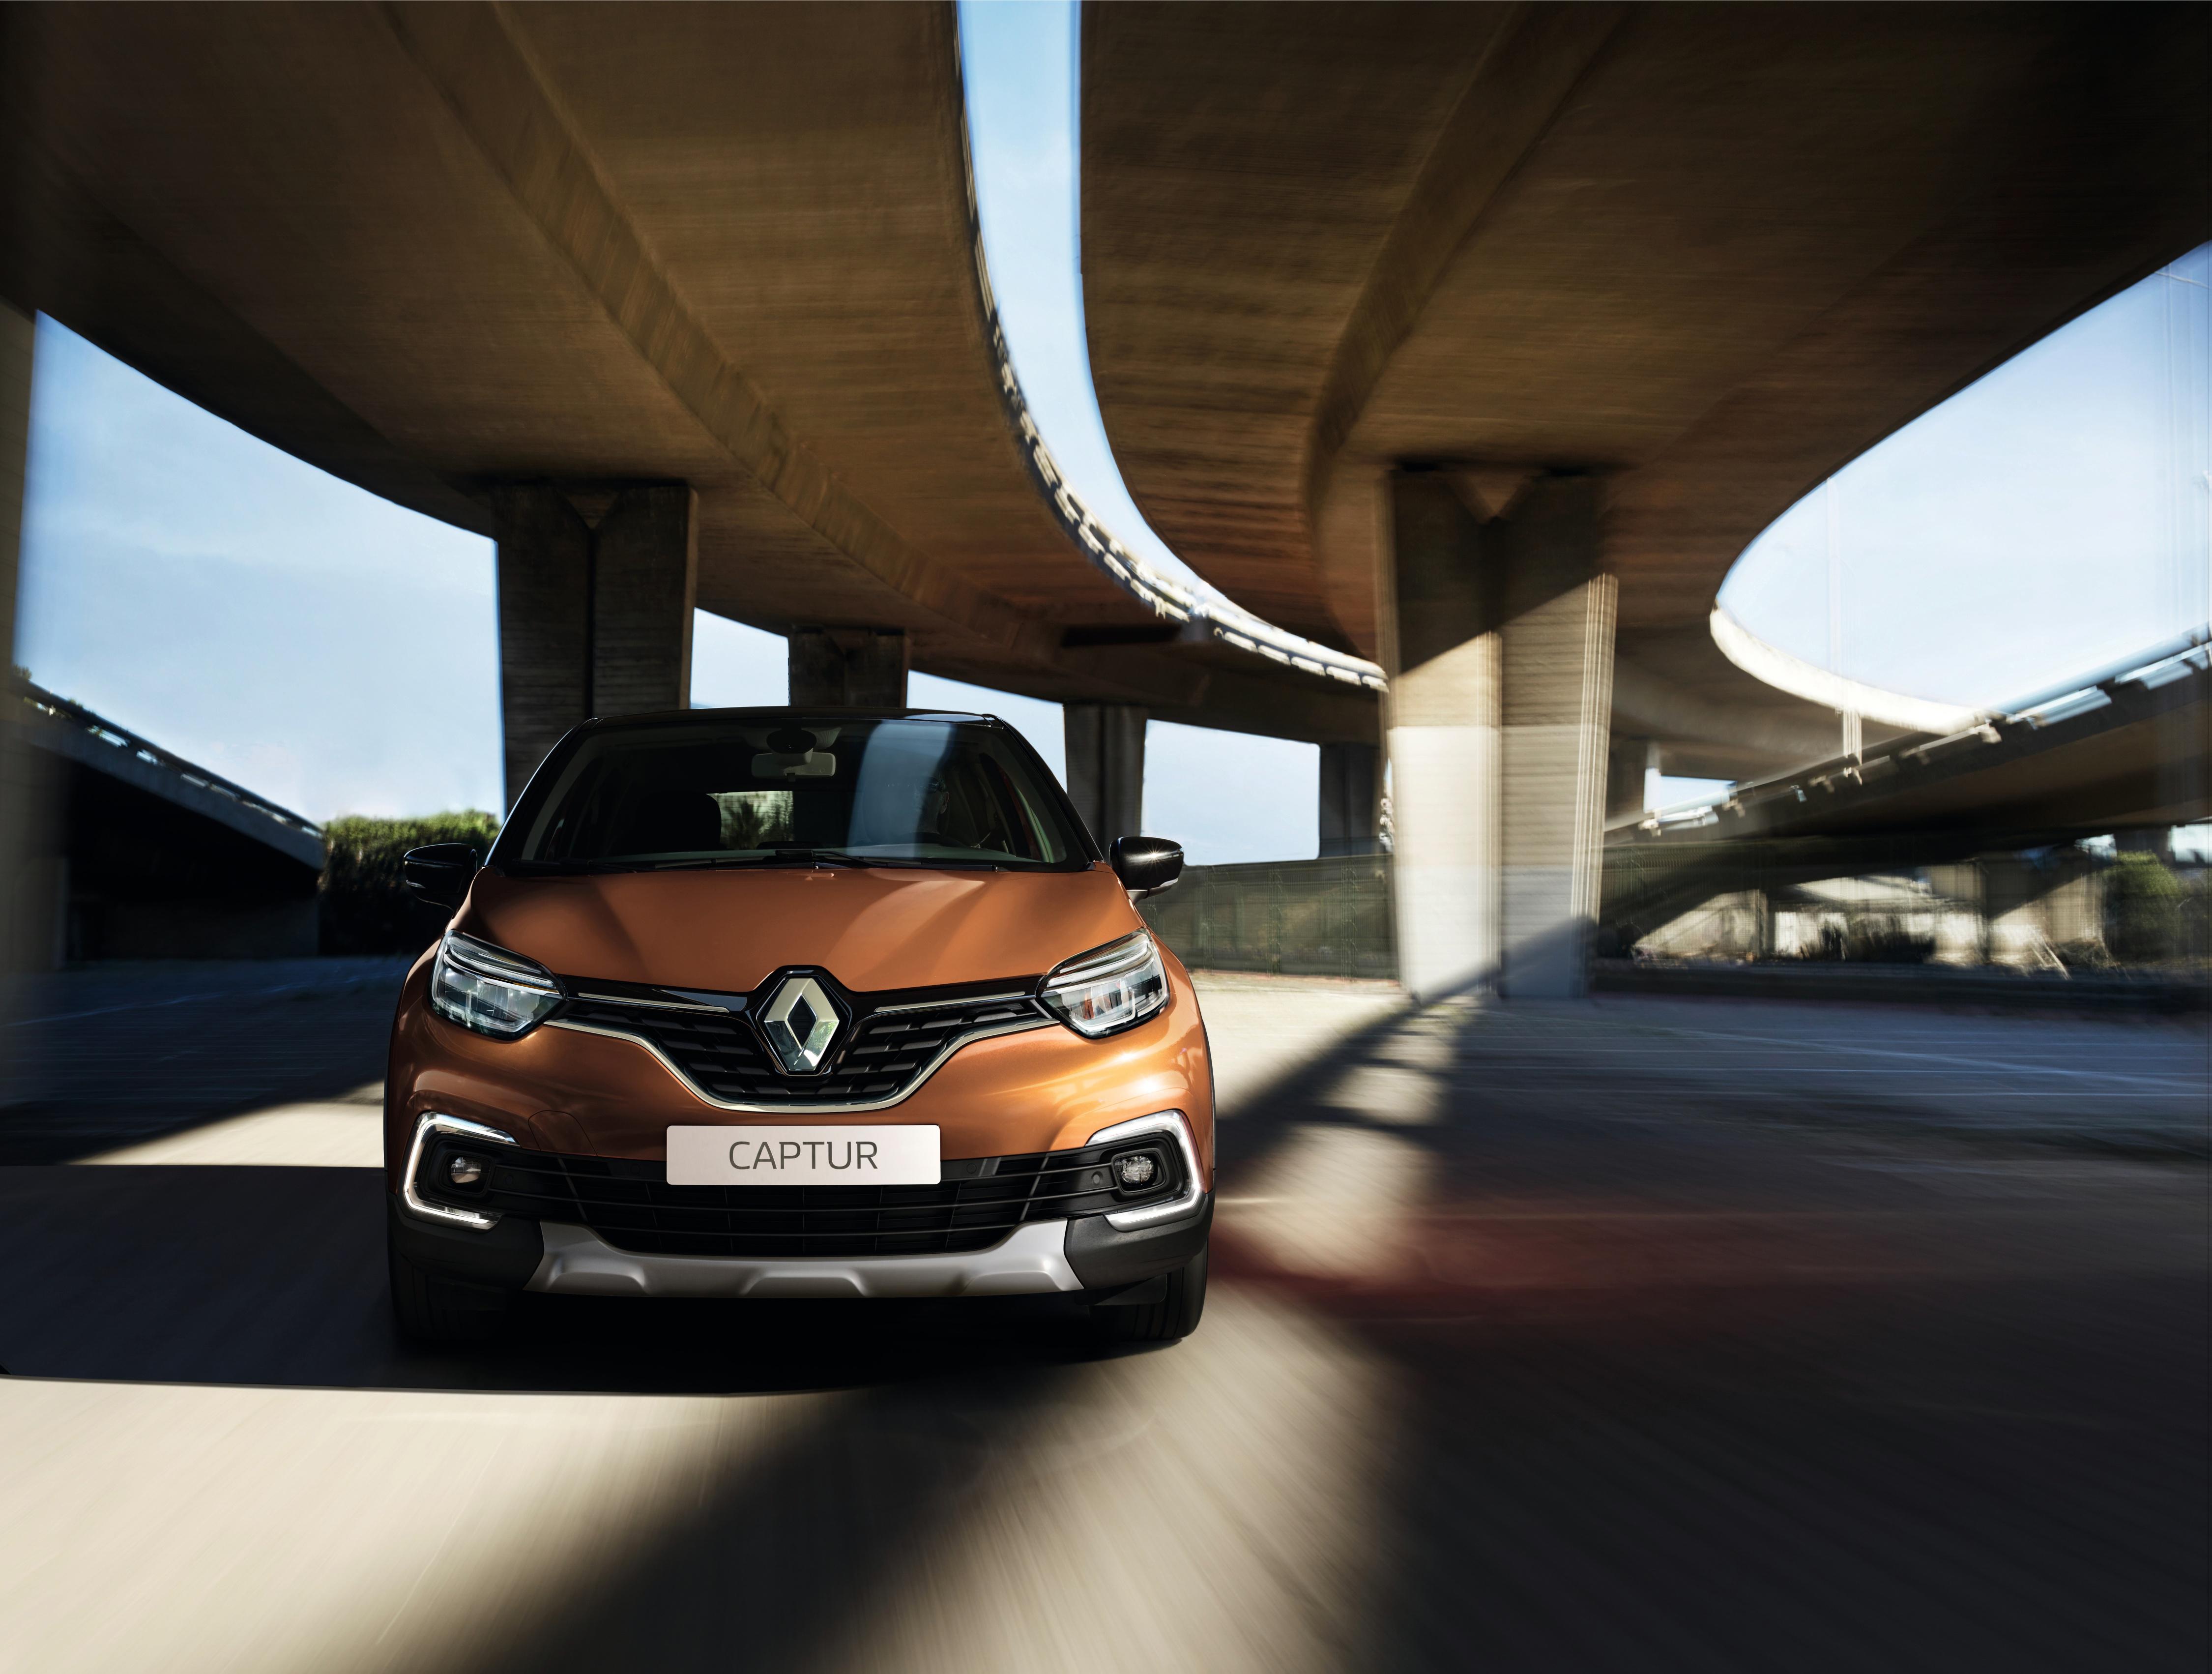 2017 Renault Captur.